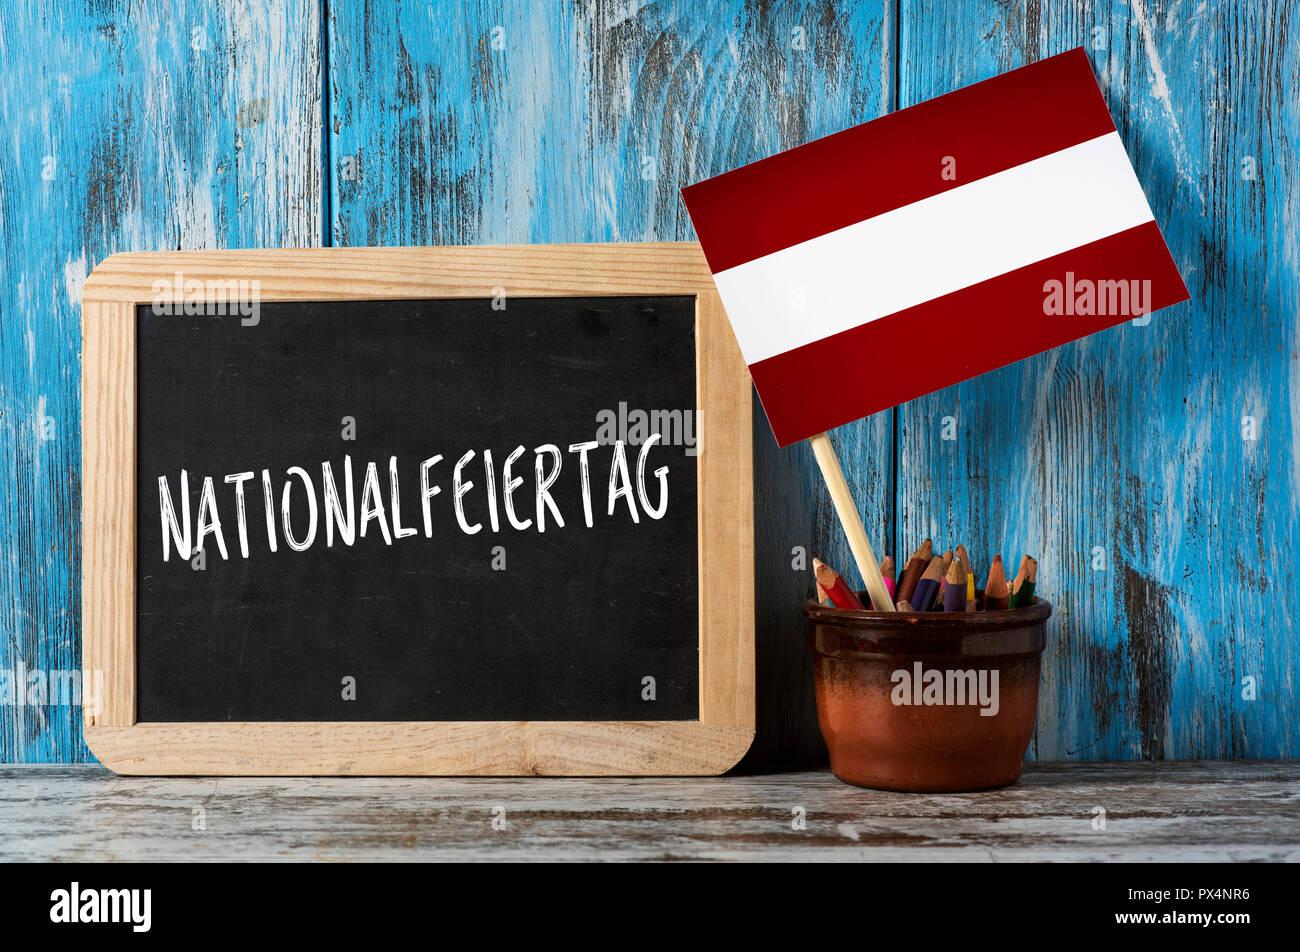 bf61035f7fb Austrian German Flag Stock Photos   Austrian German Flag Stock ...